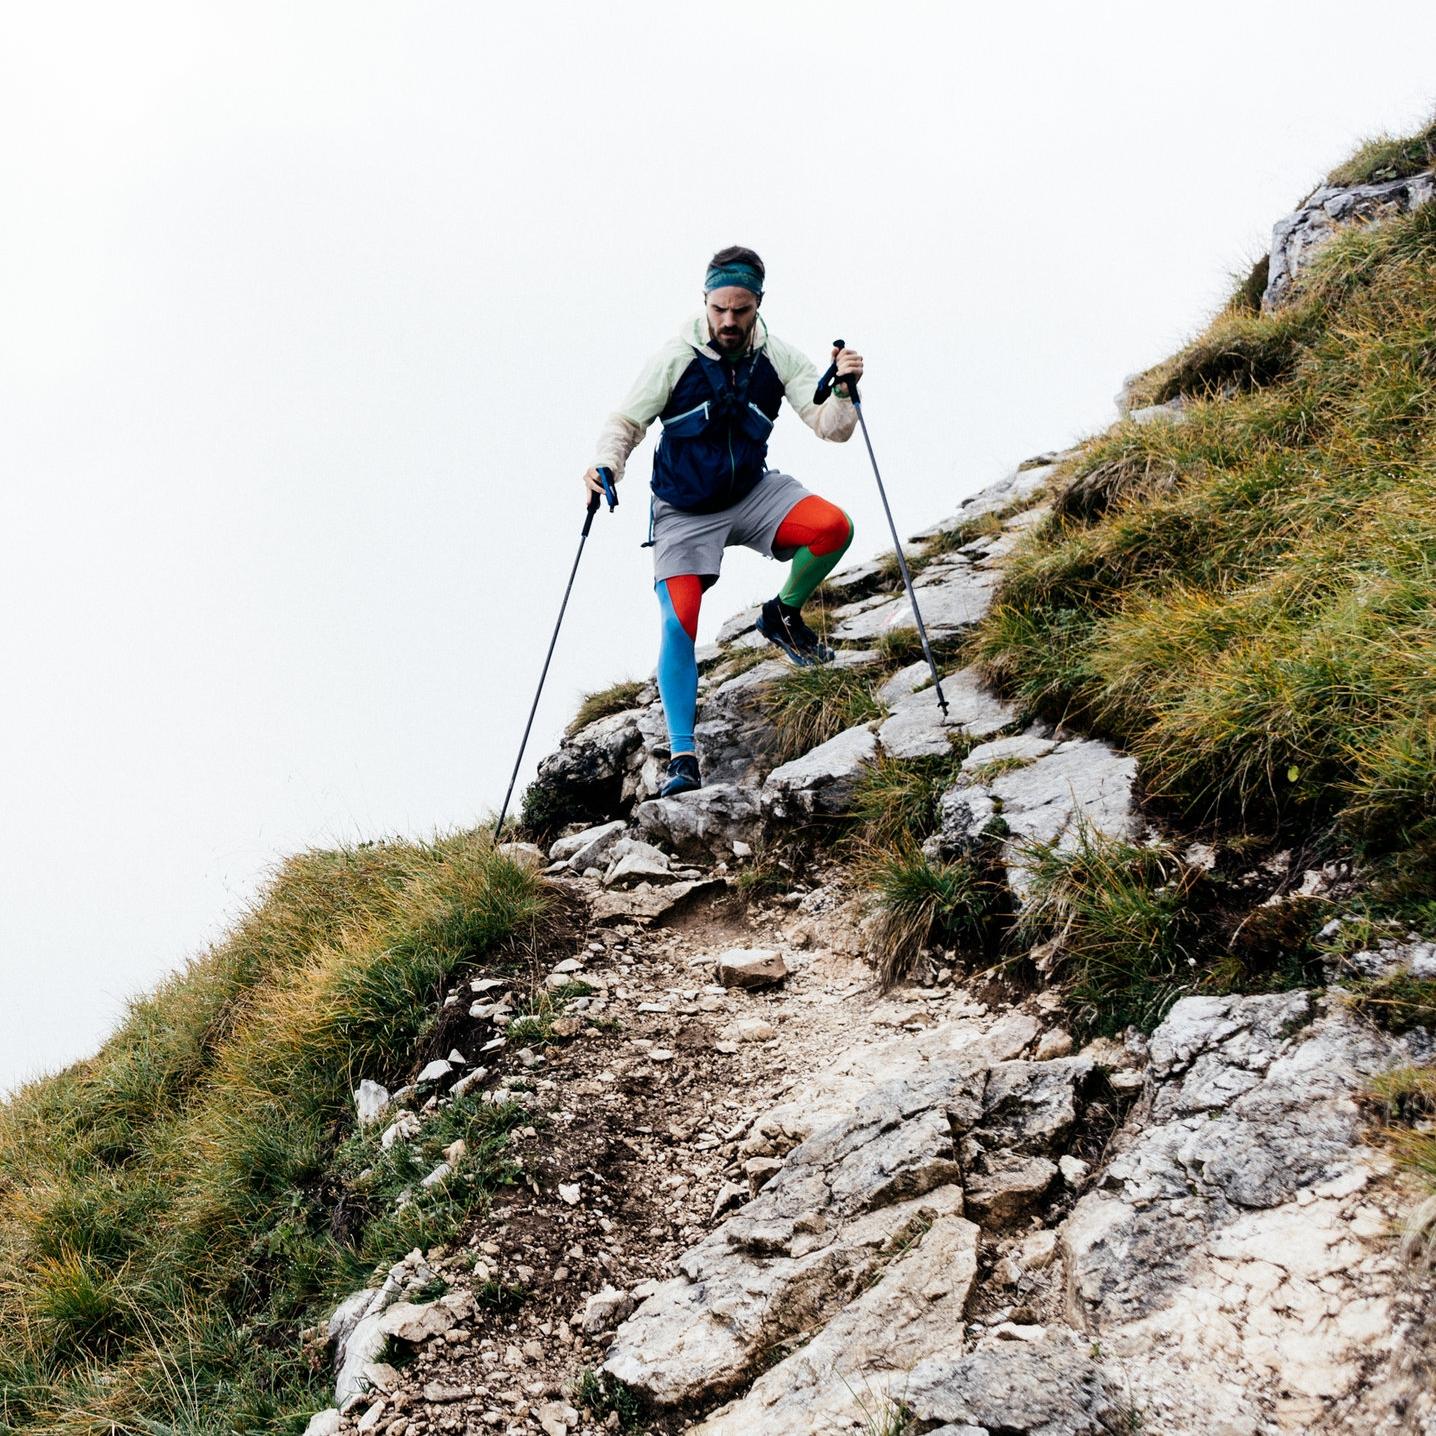 Dolomites-ChrisBrinleeJr-SEP17-38.jpg